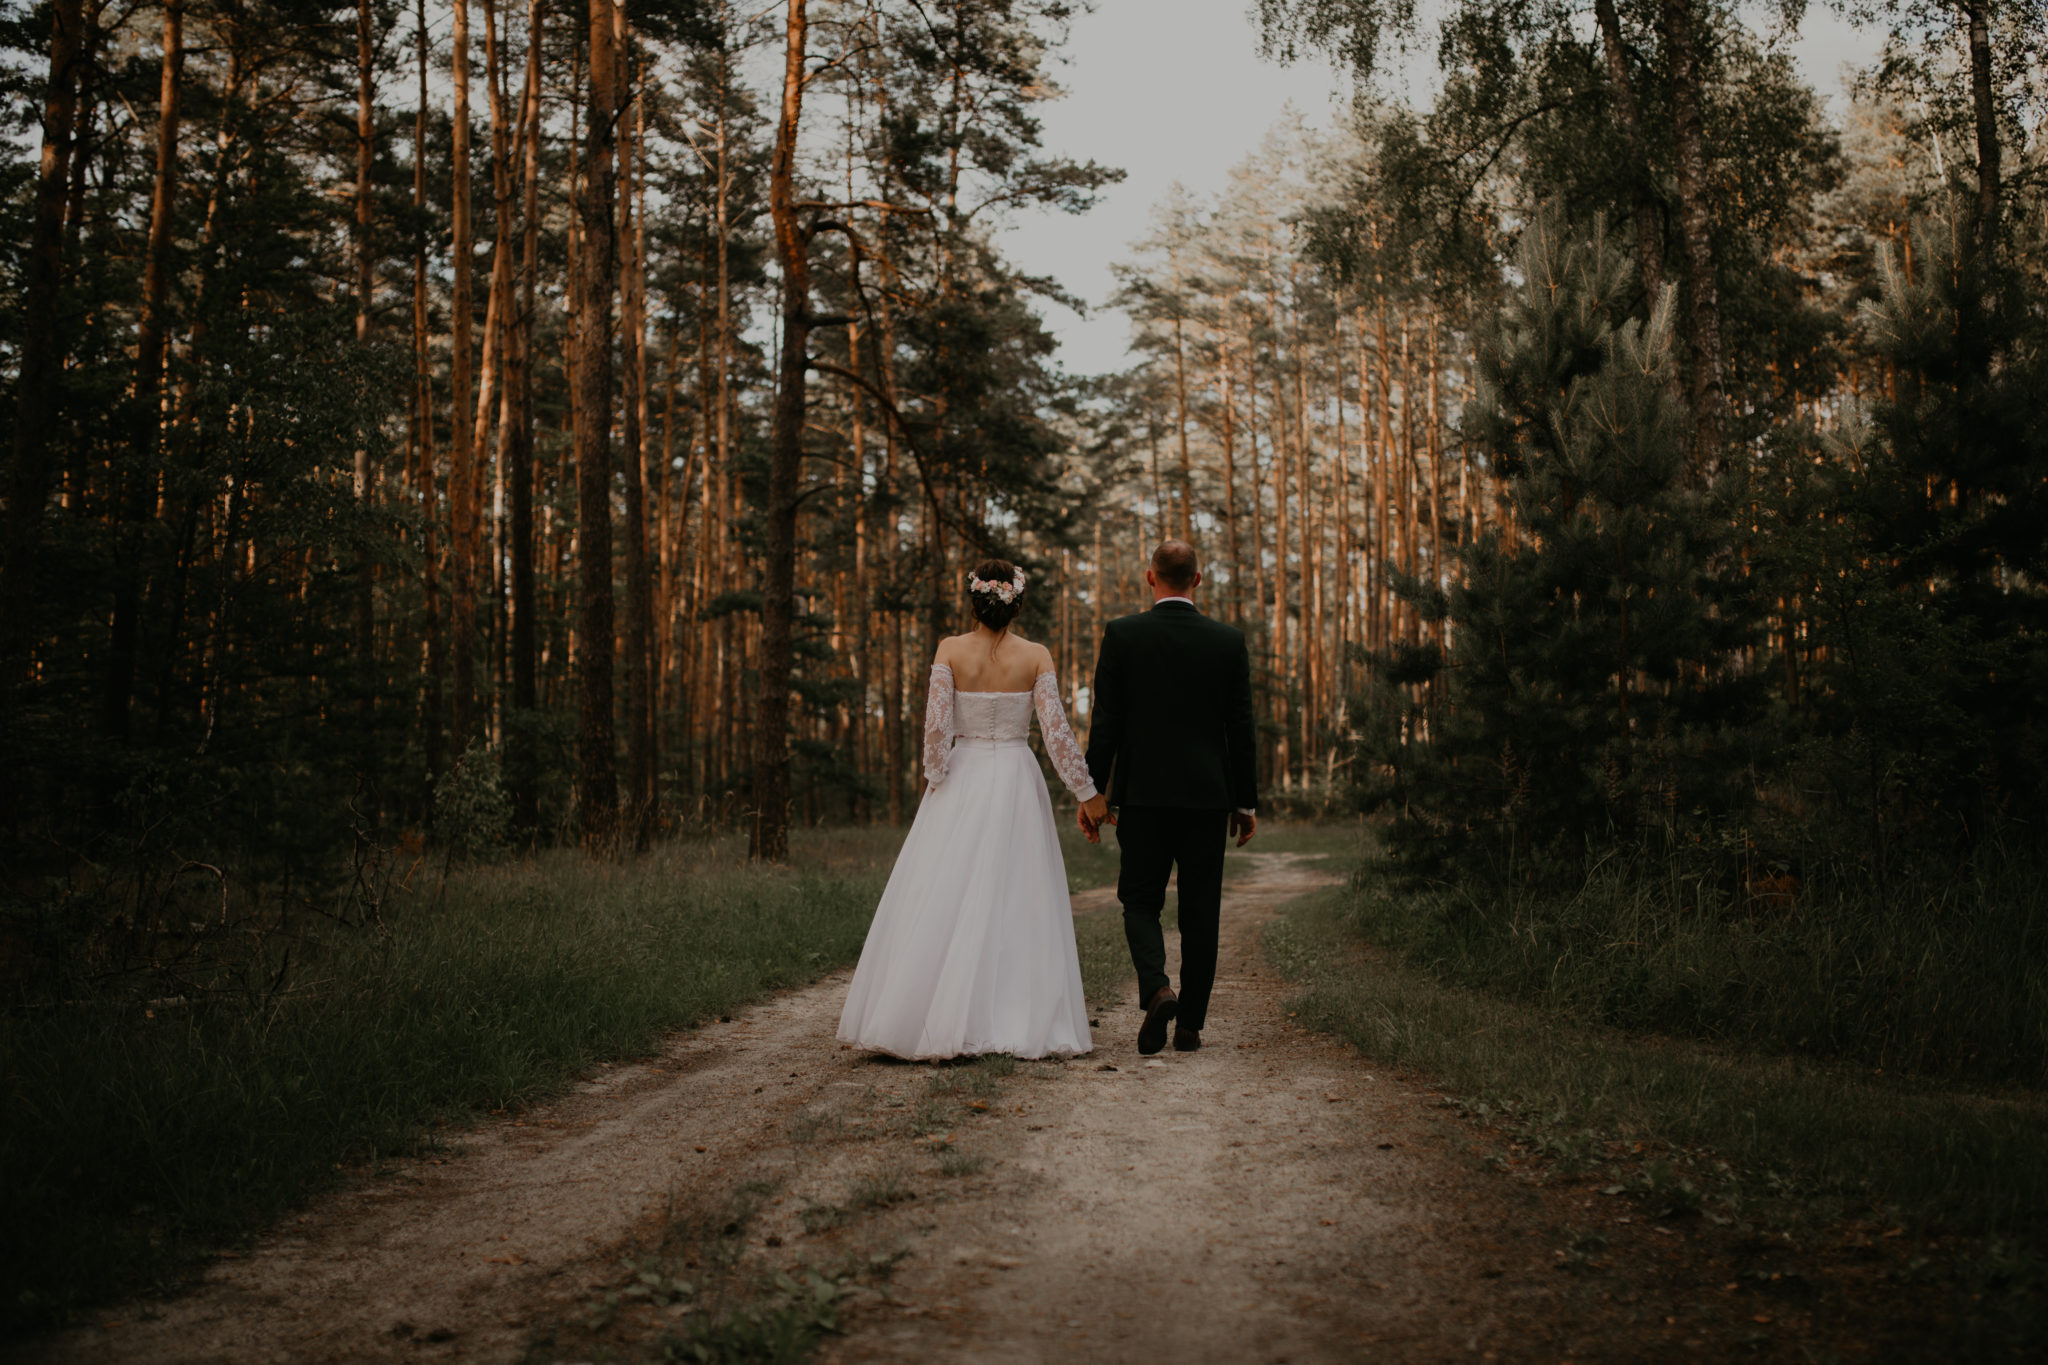 gosia i kubaplener 6 1 - fotografiagk Fotografia ślubna RK wedding